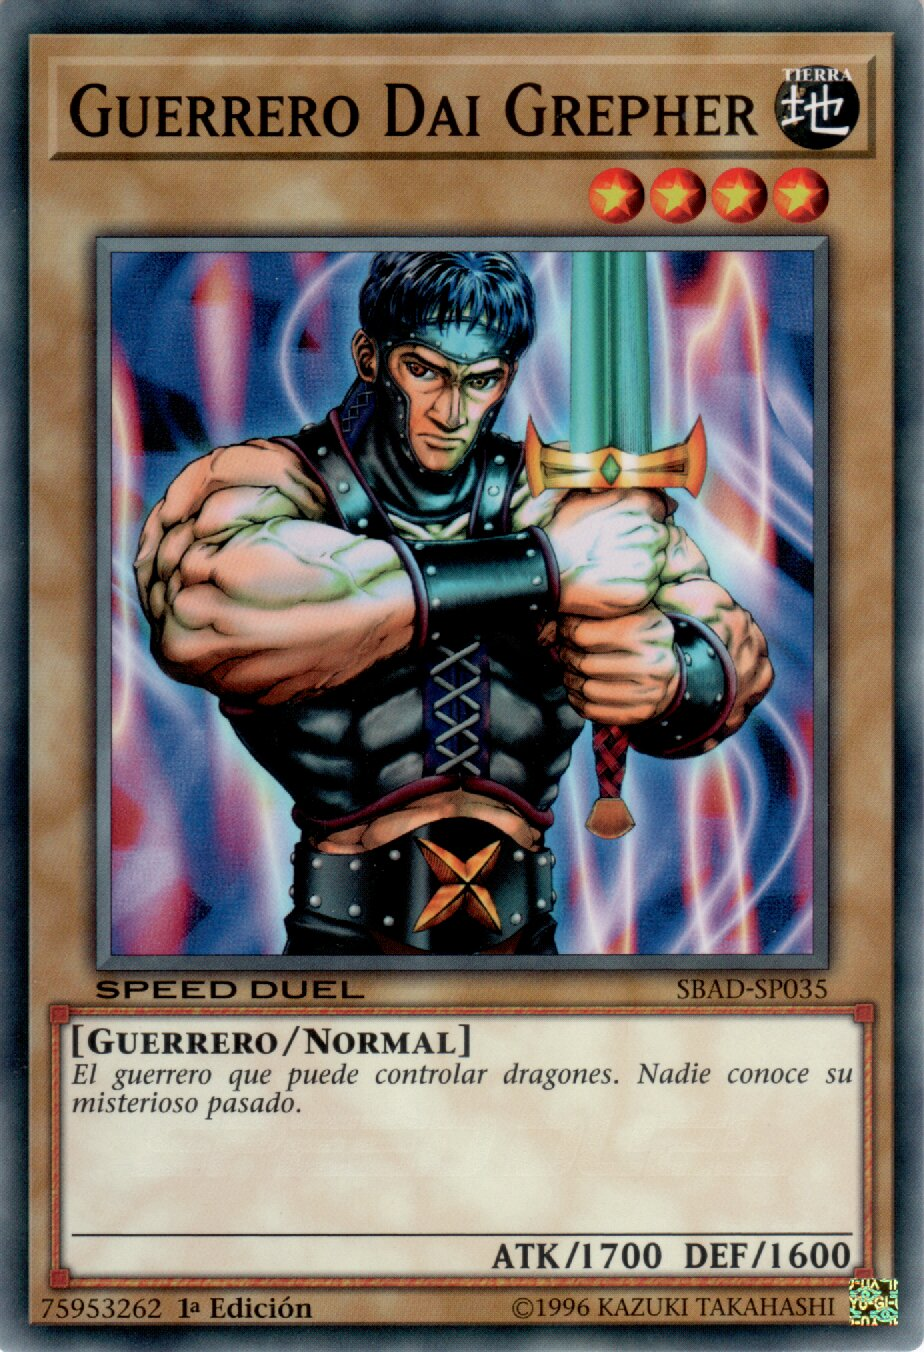 Guerrero Dai Grepher